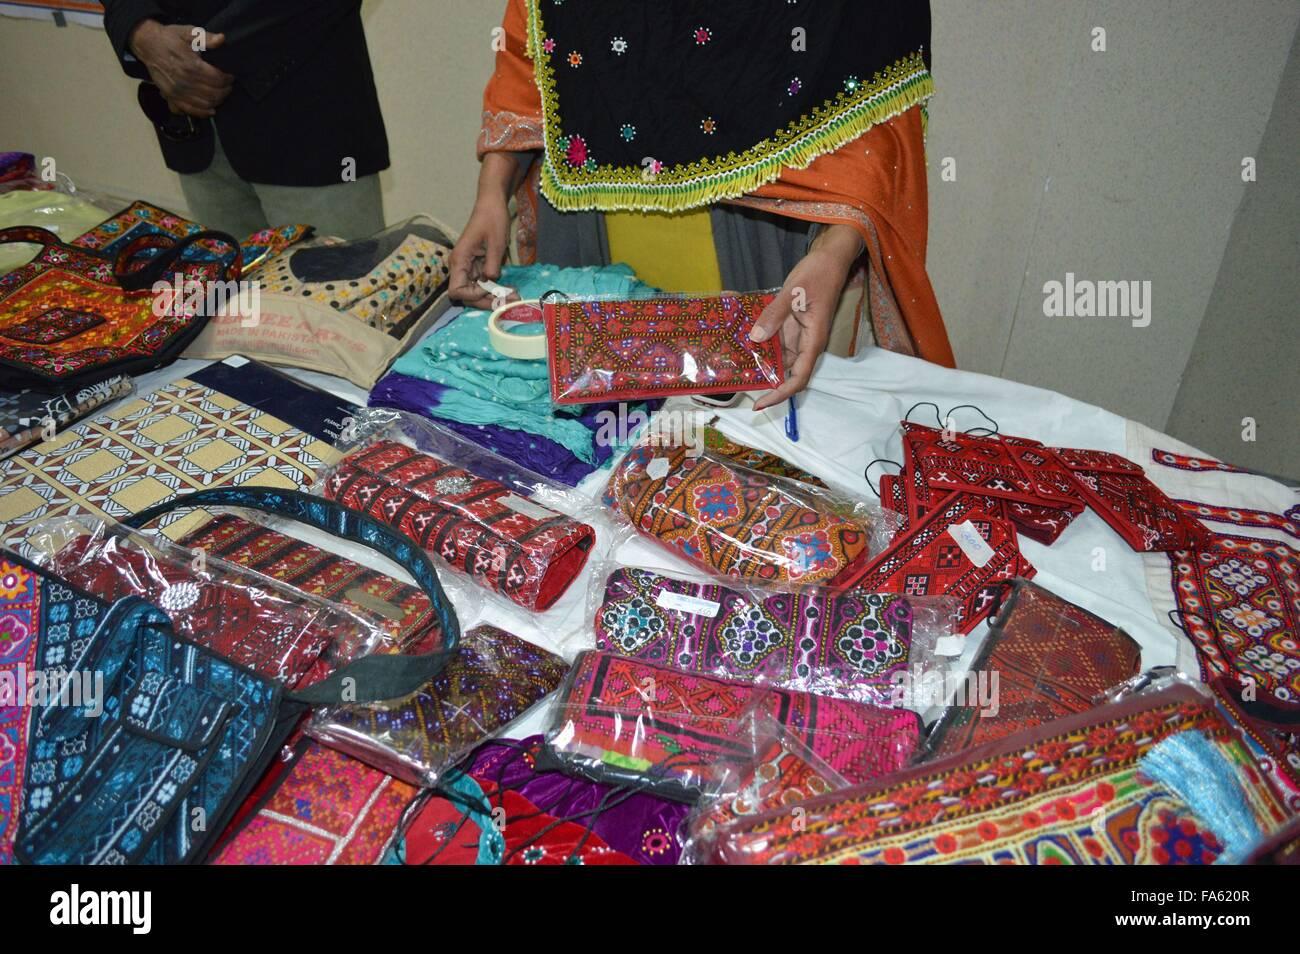 Handicrafts Of Pakistan Stock Photos Handicrafts Of Pakistan Stock